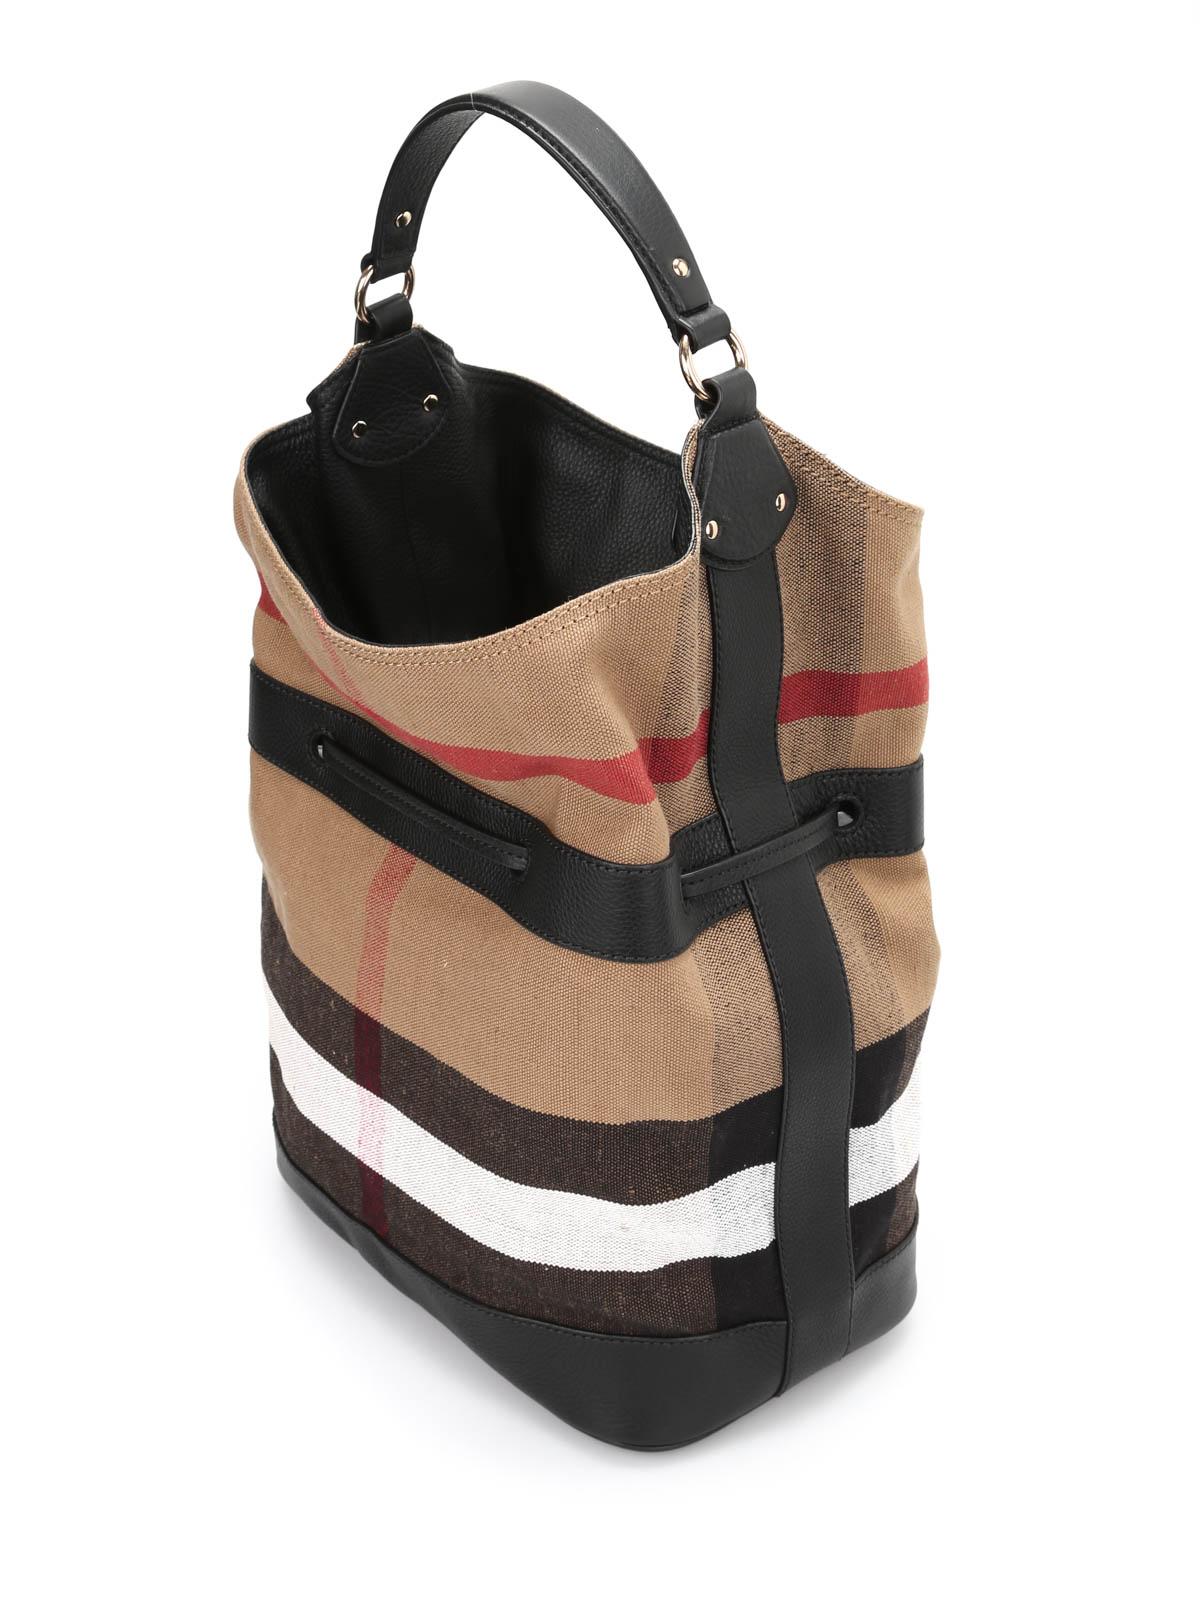 Burberry - Large Ashby canvas bag - Bucket bags - 39978501   iKRIX.com